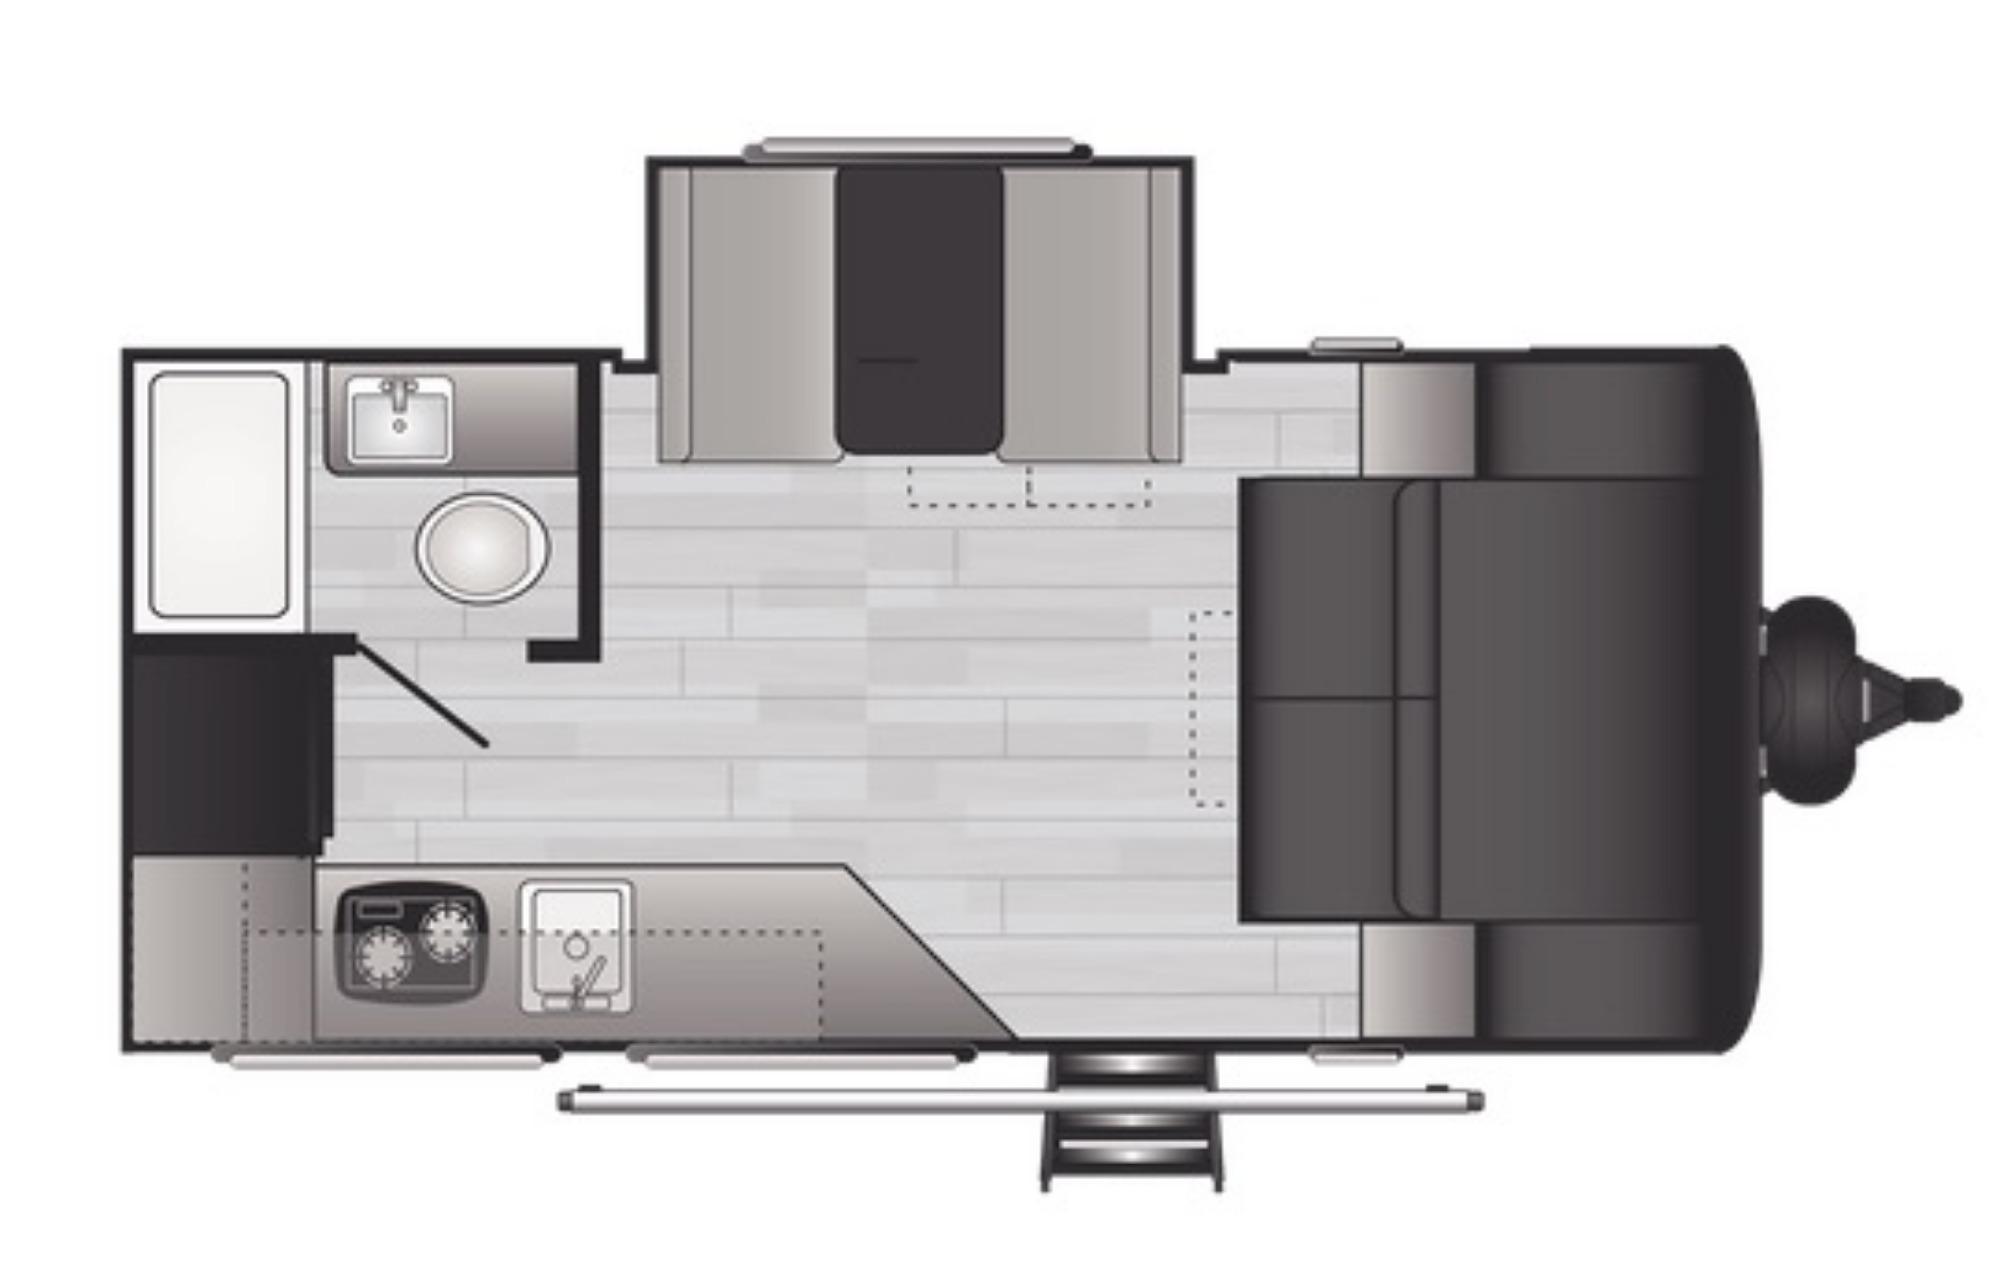 View Floor Plan for 2022 KEYSTONE HIDEOUT 174RK